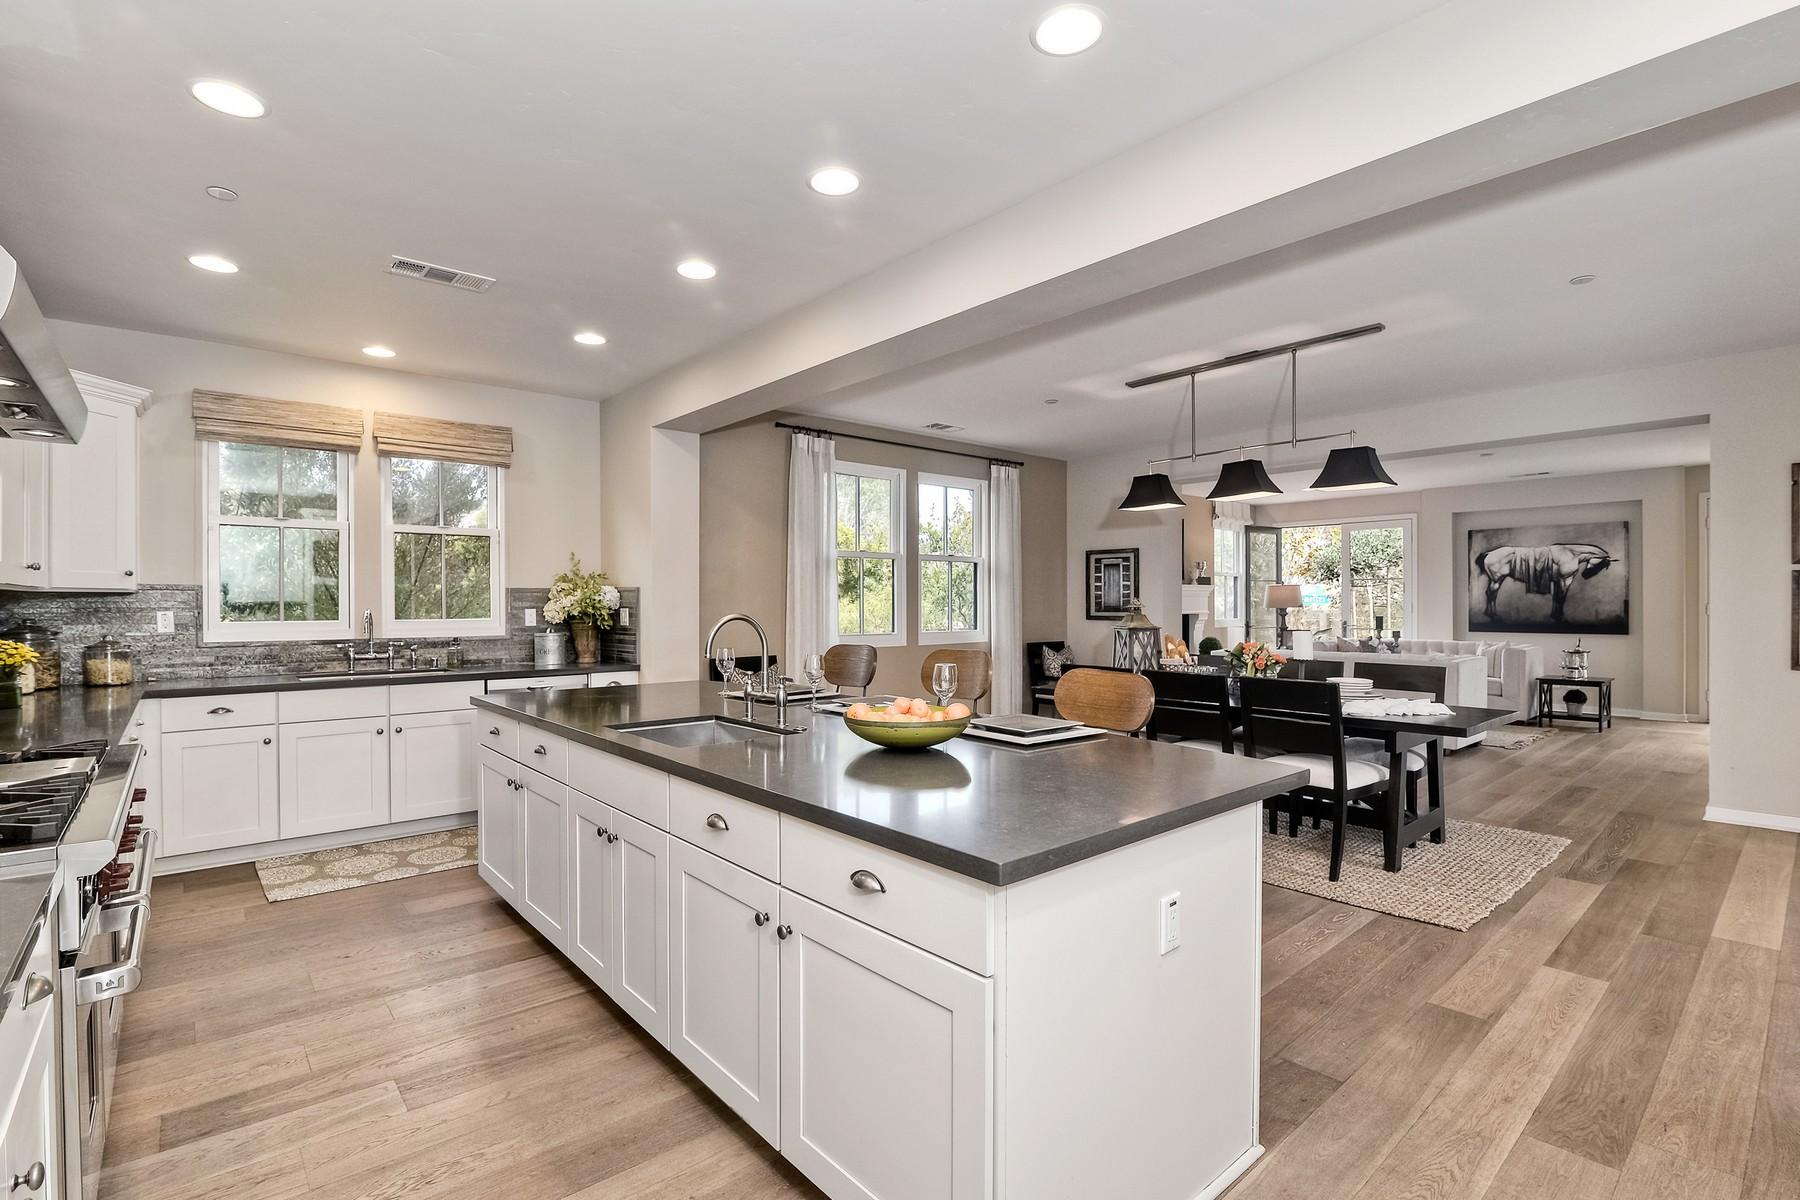 Single Family Home for Sale at 1497 Halia Court Encinitas, California 92024 United States